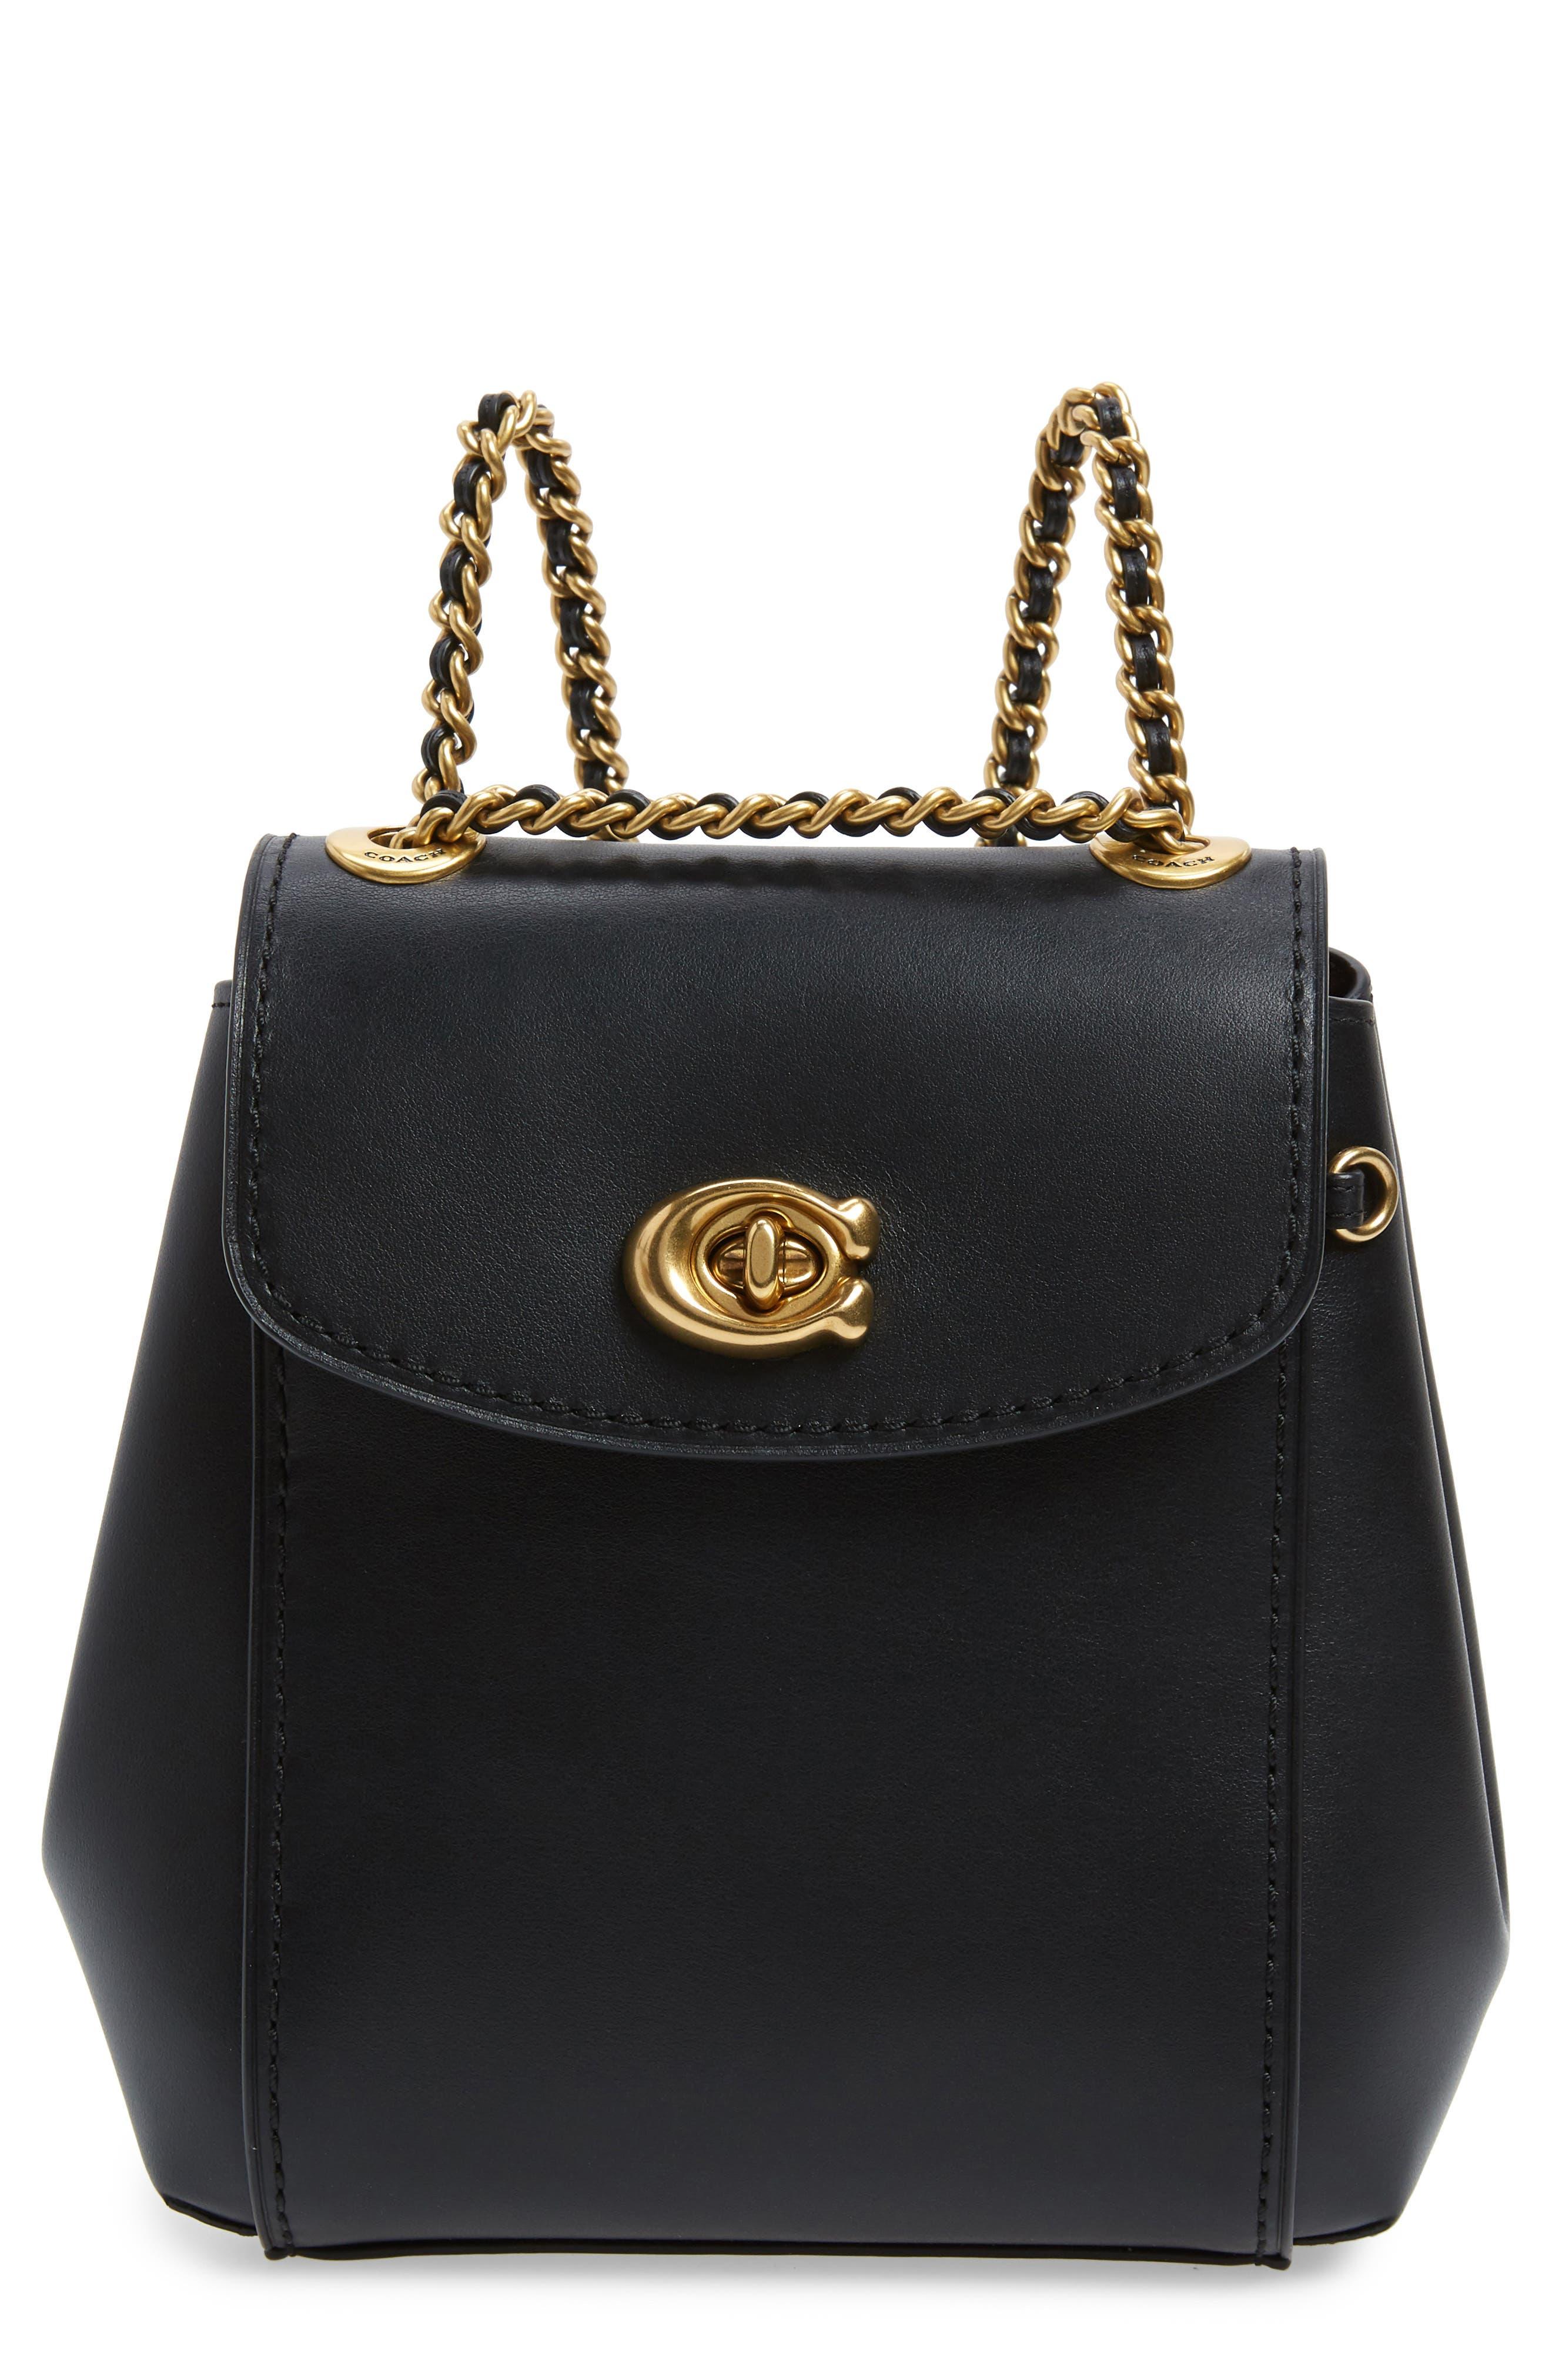 COACH, Parker 16 Convertible Calfskin Leather Backpack, Main thumbnail 1, color, B4/ BLACK